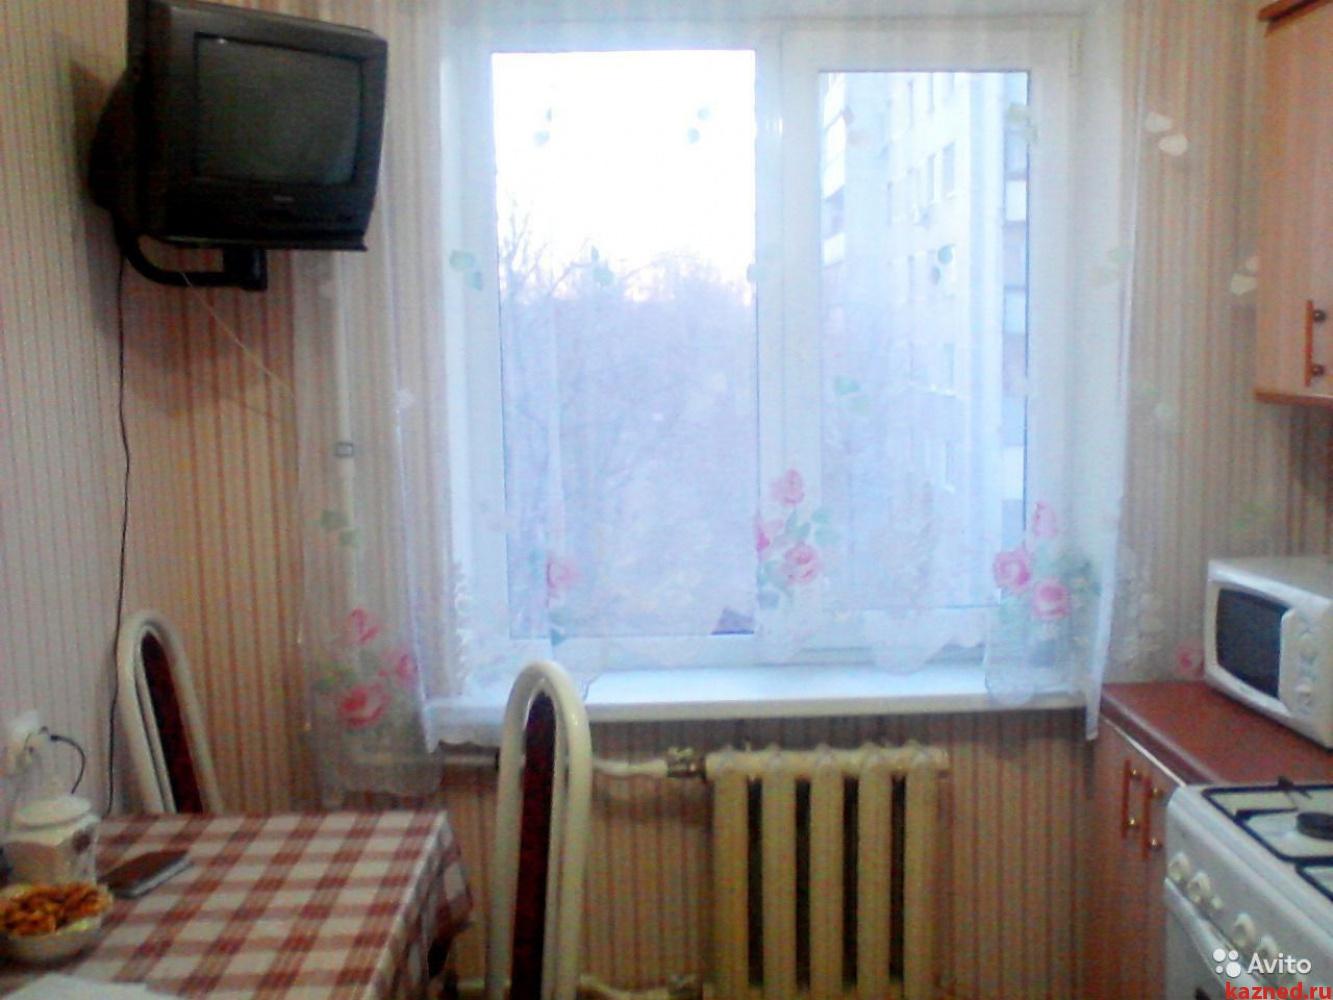 Продажа 3-к квартиры Ямашева 54, 65 м2  (миниатюра №2)